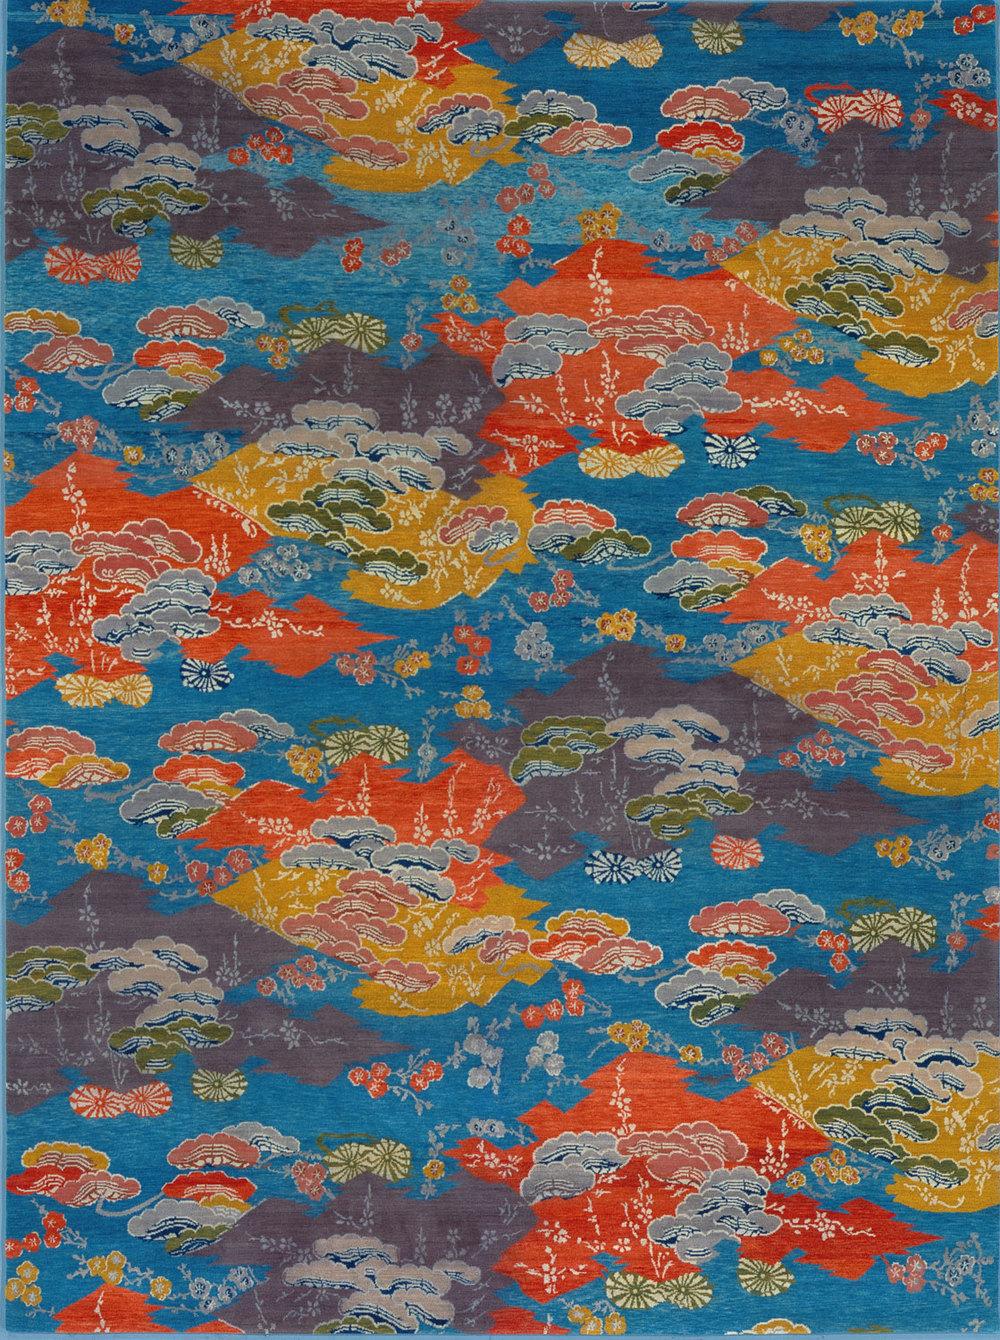 17367-Mountain-Blossom.jpg